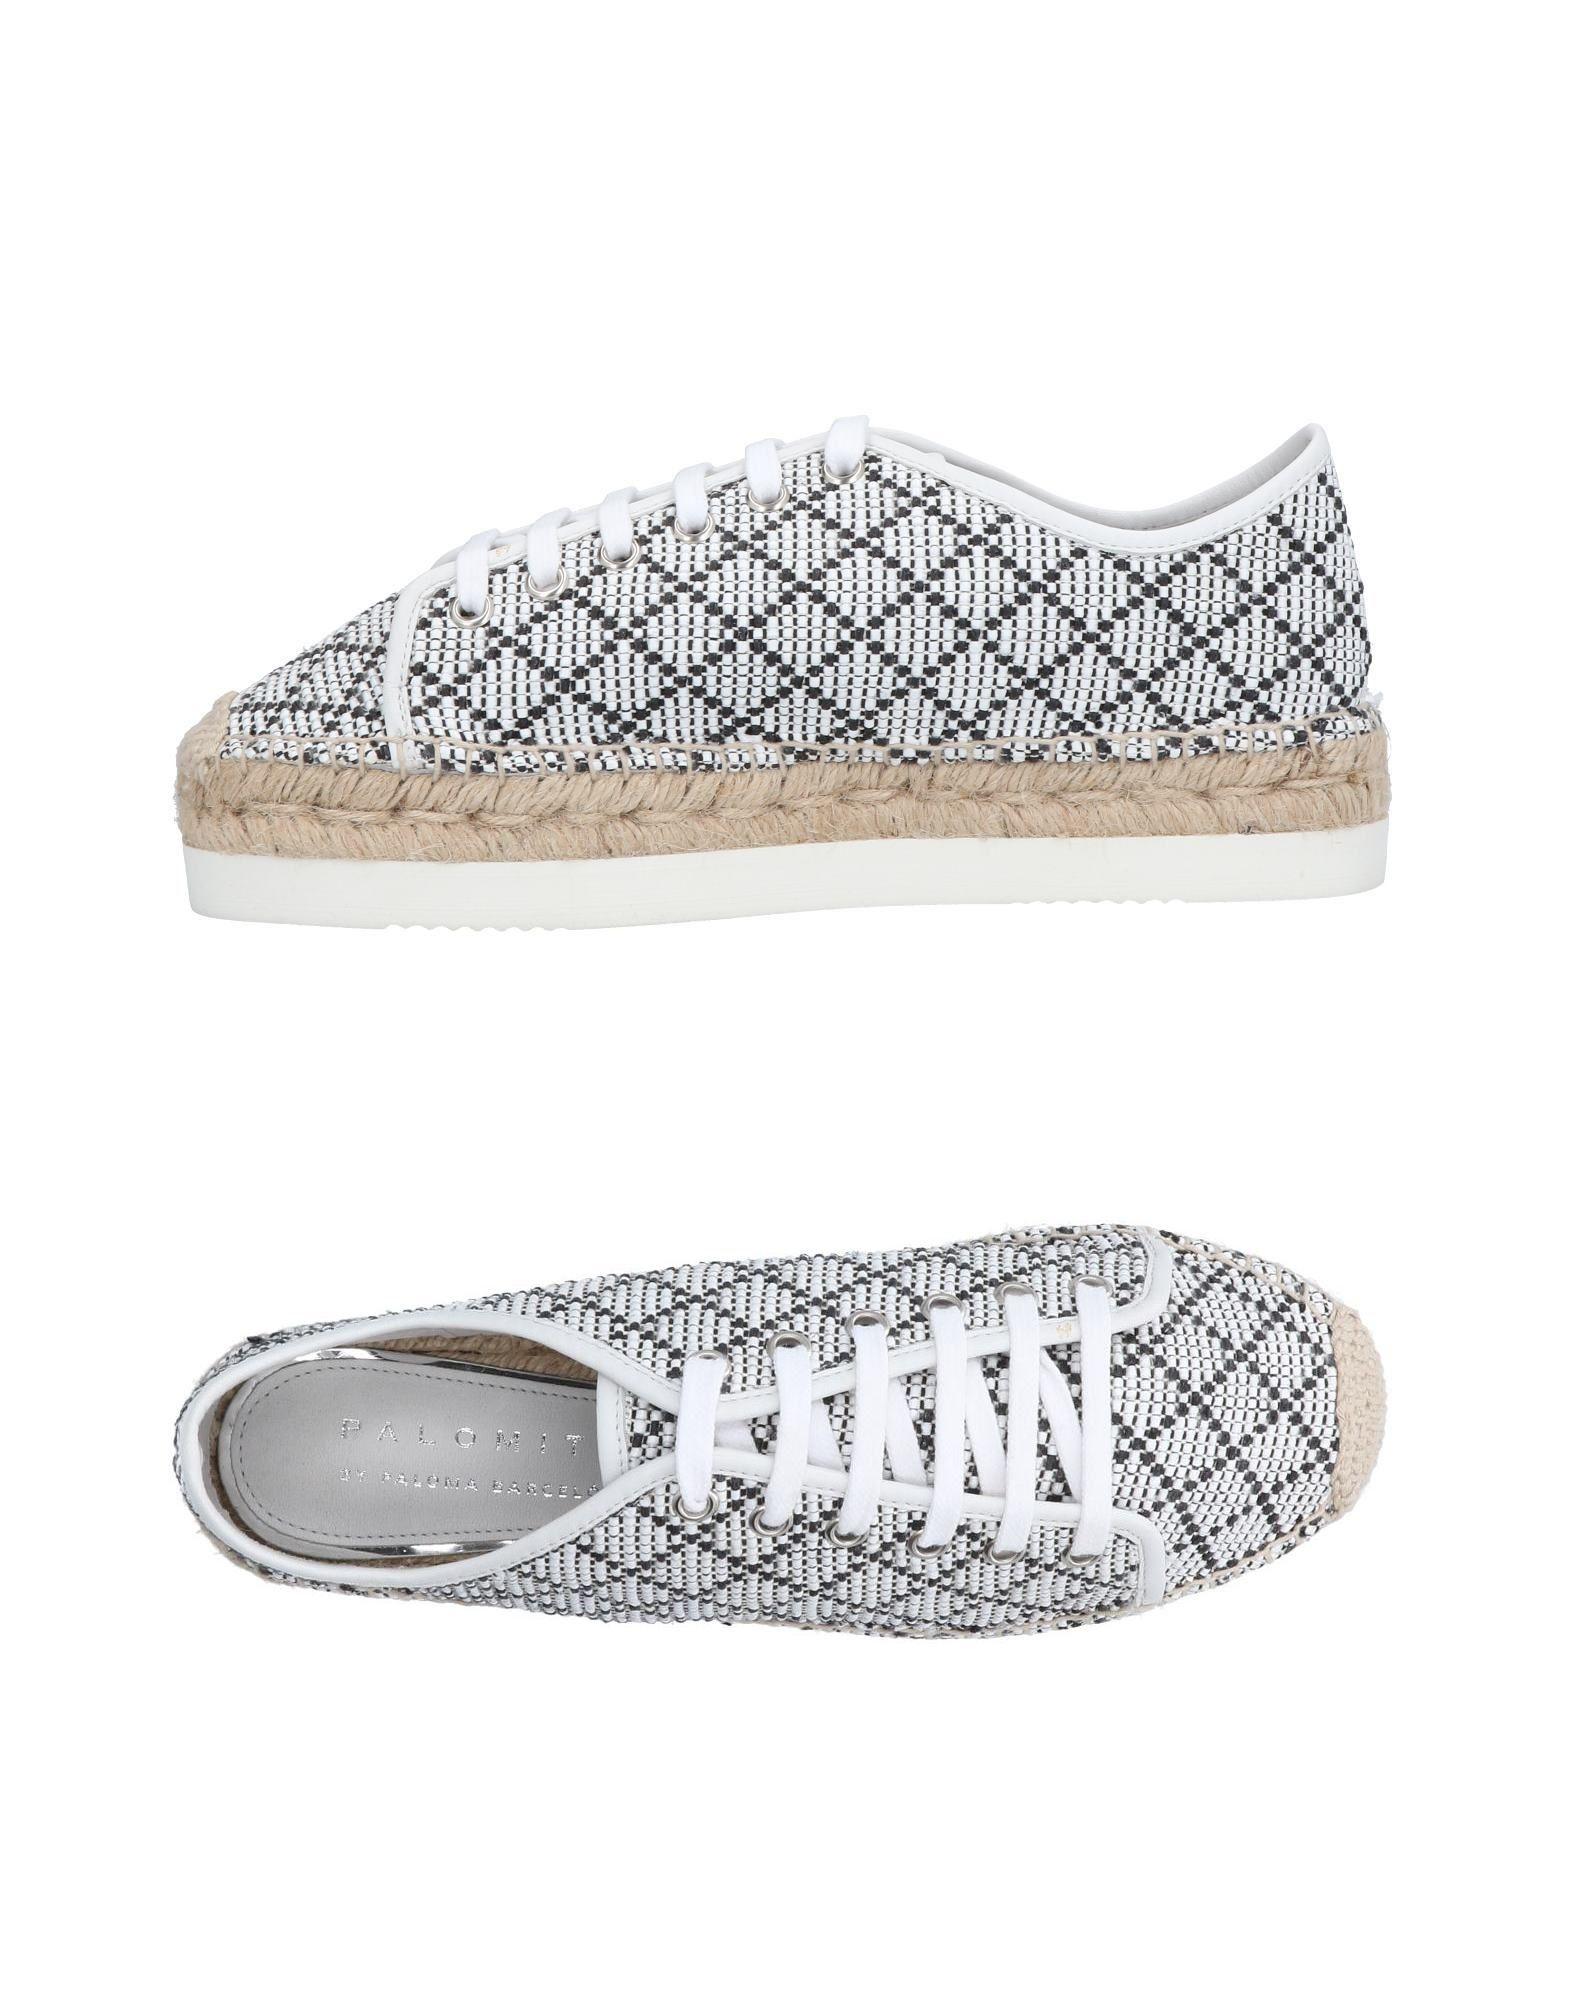 Palomitas By Paloma Barceló Sneakers Damen  11485407KQ Gute Qualität beliebte Schuhe